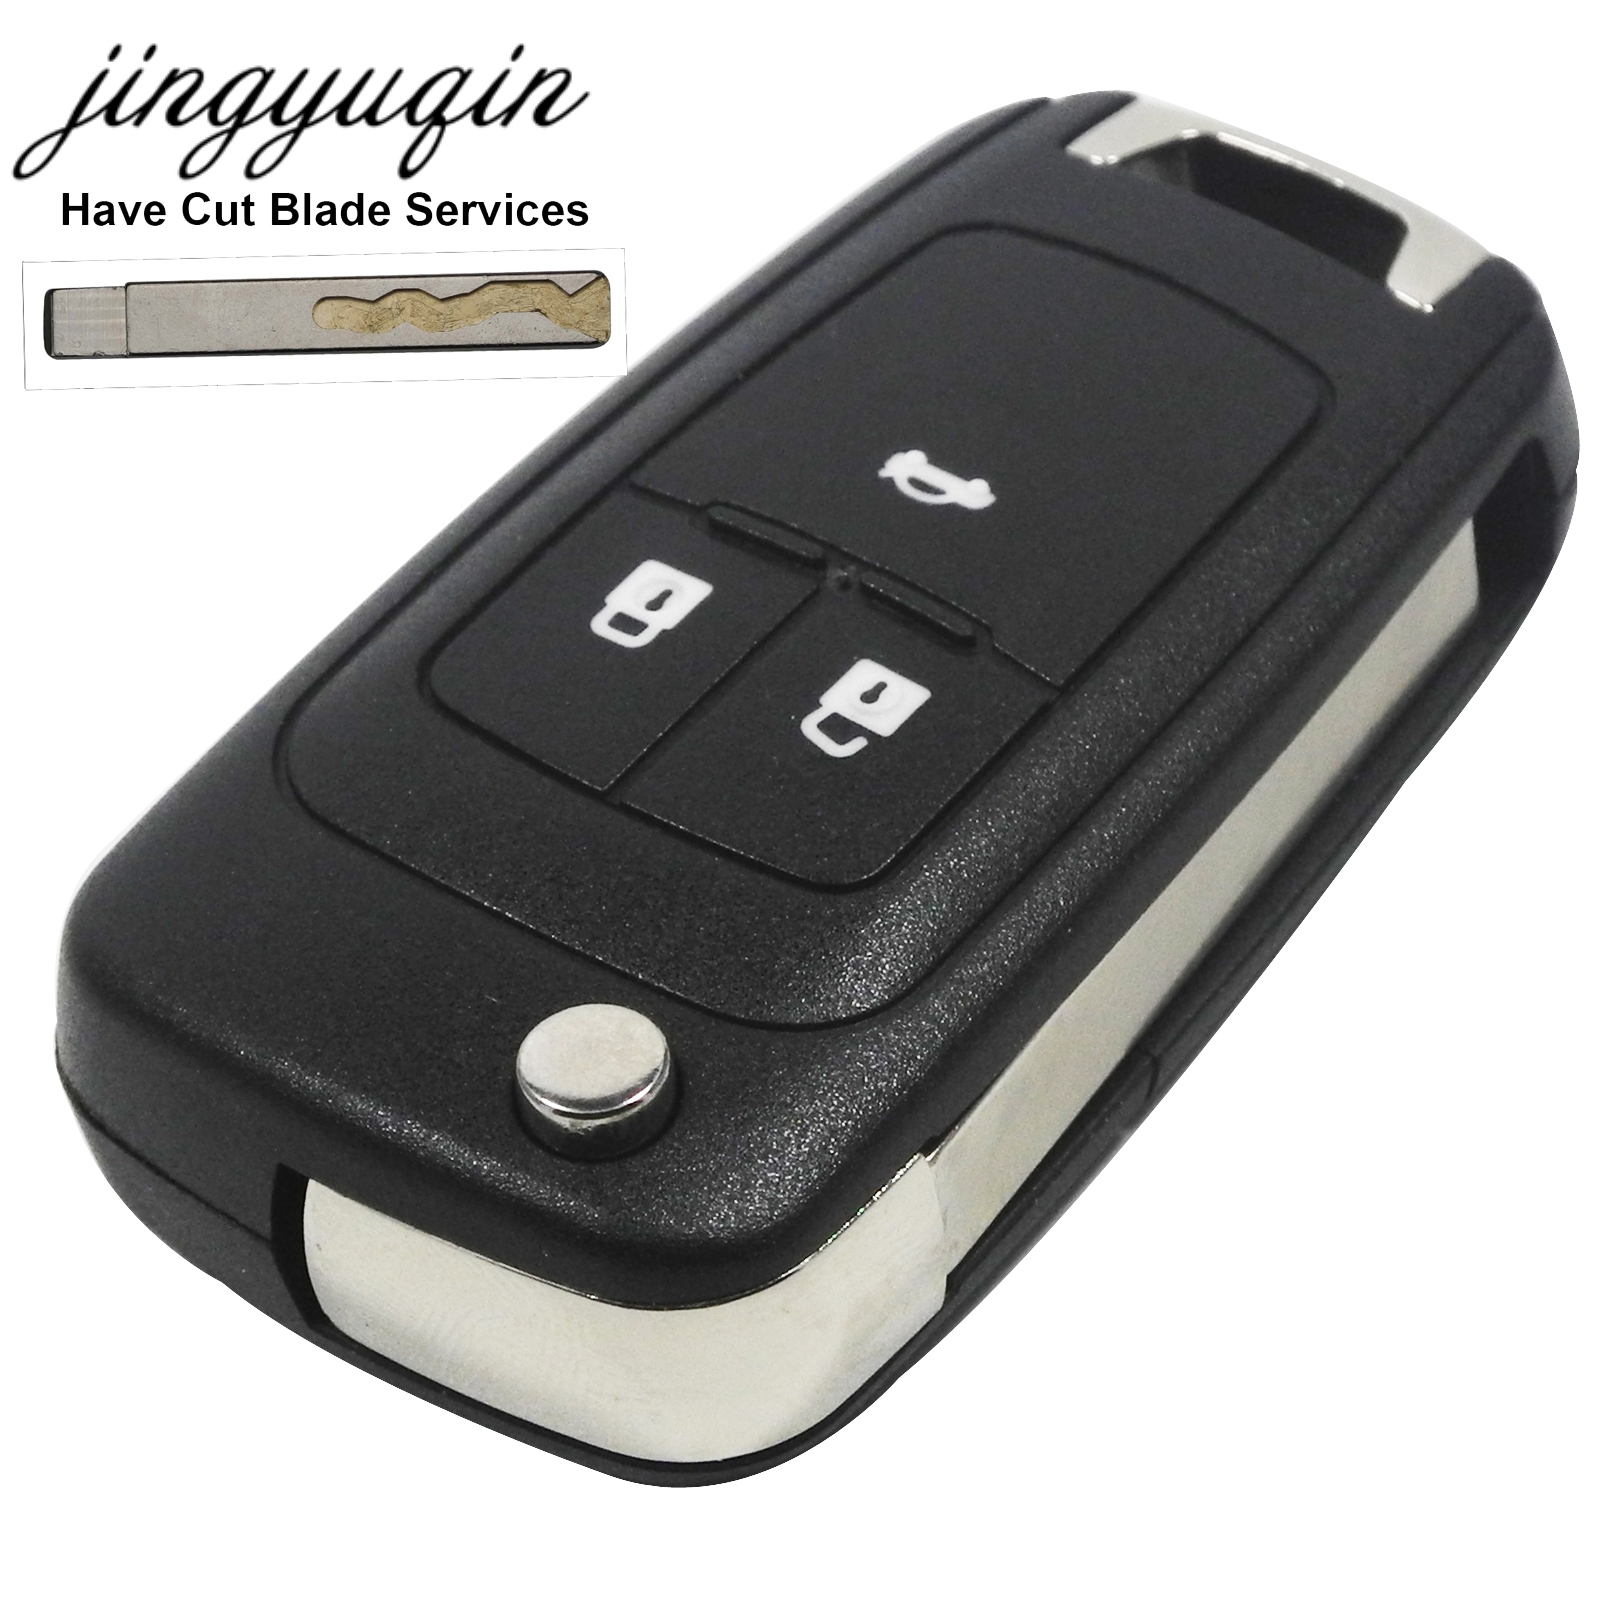 jingyuqin Flip CNC Copy Cut Blade Key Shell for Chevrolet Cruze Remote Key Case Keyless Fob 3 Button Include Cutting Blade 8055i cnc 8055i a m fagor key button membrane for cnc system fast shipping